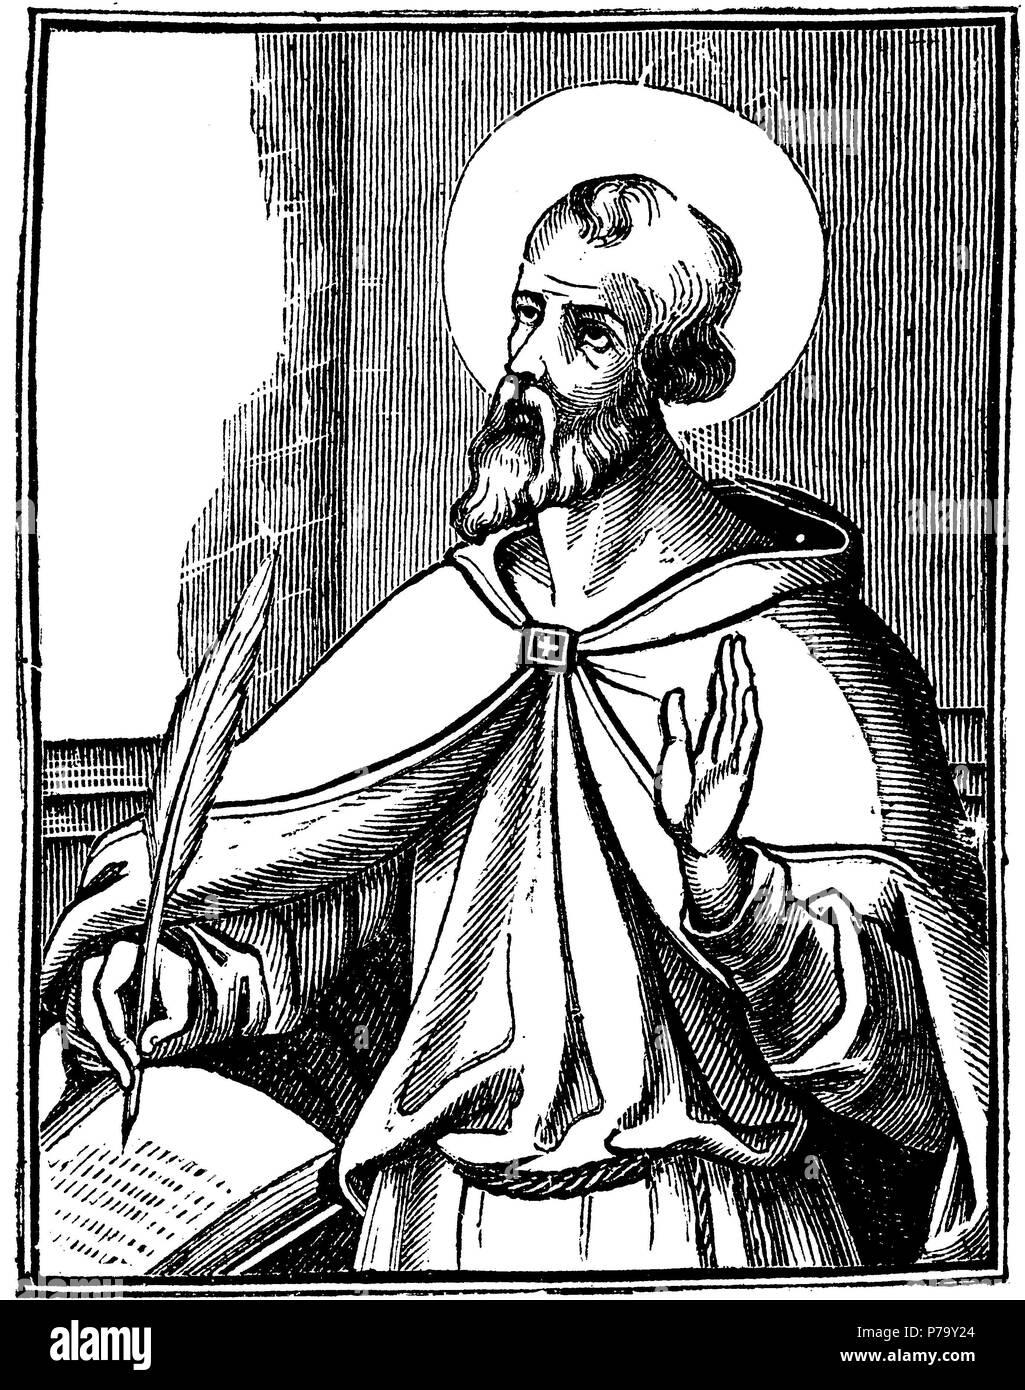 St. Hieronimus, confessor and church teacher, Stock Photo